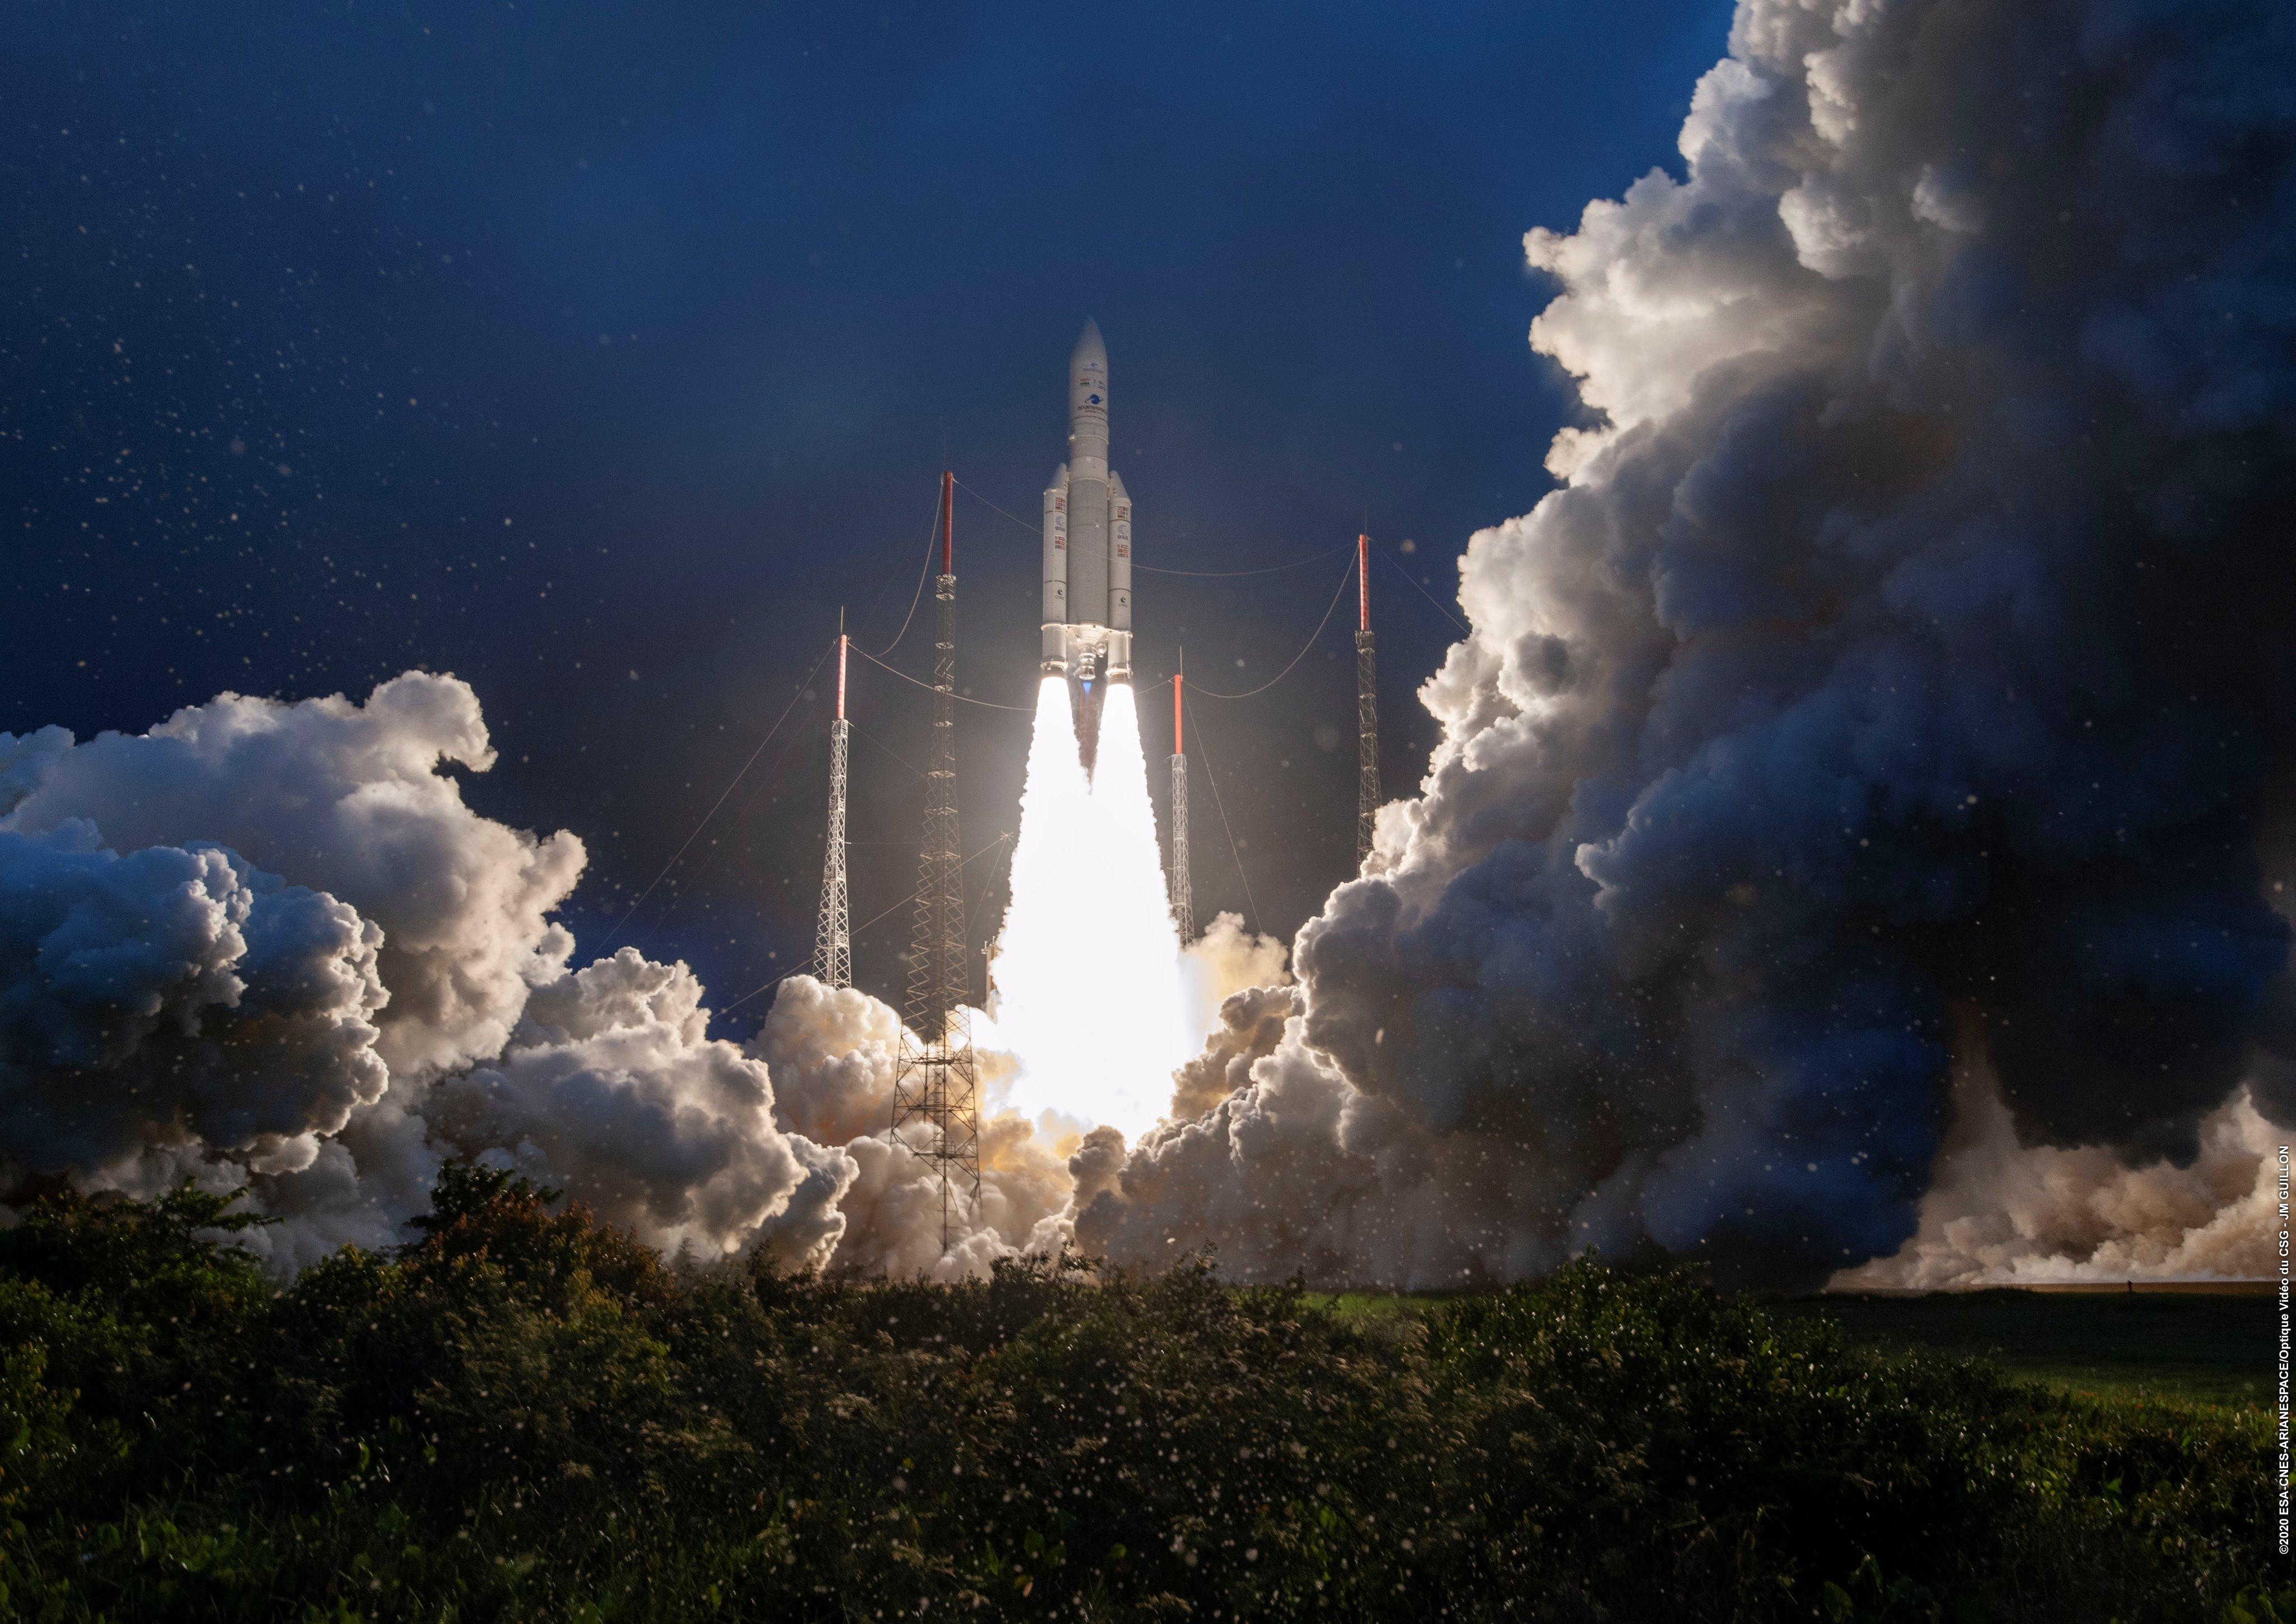 Imagen de Ariane 5 depegando